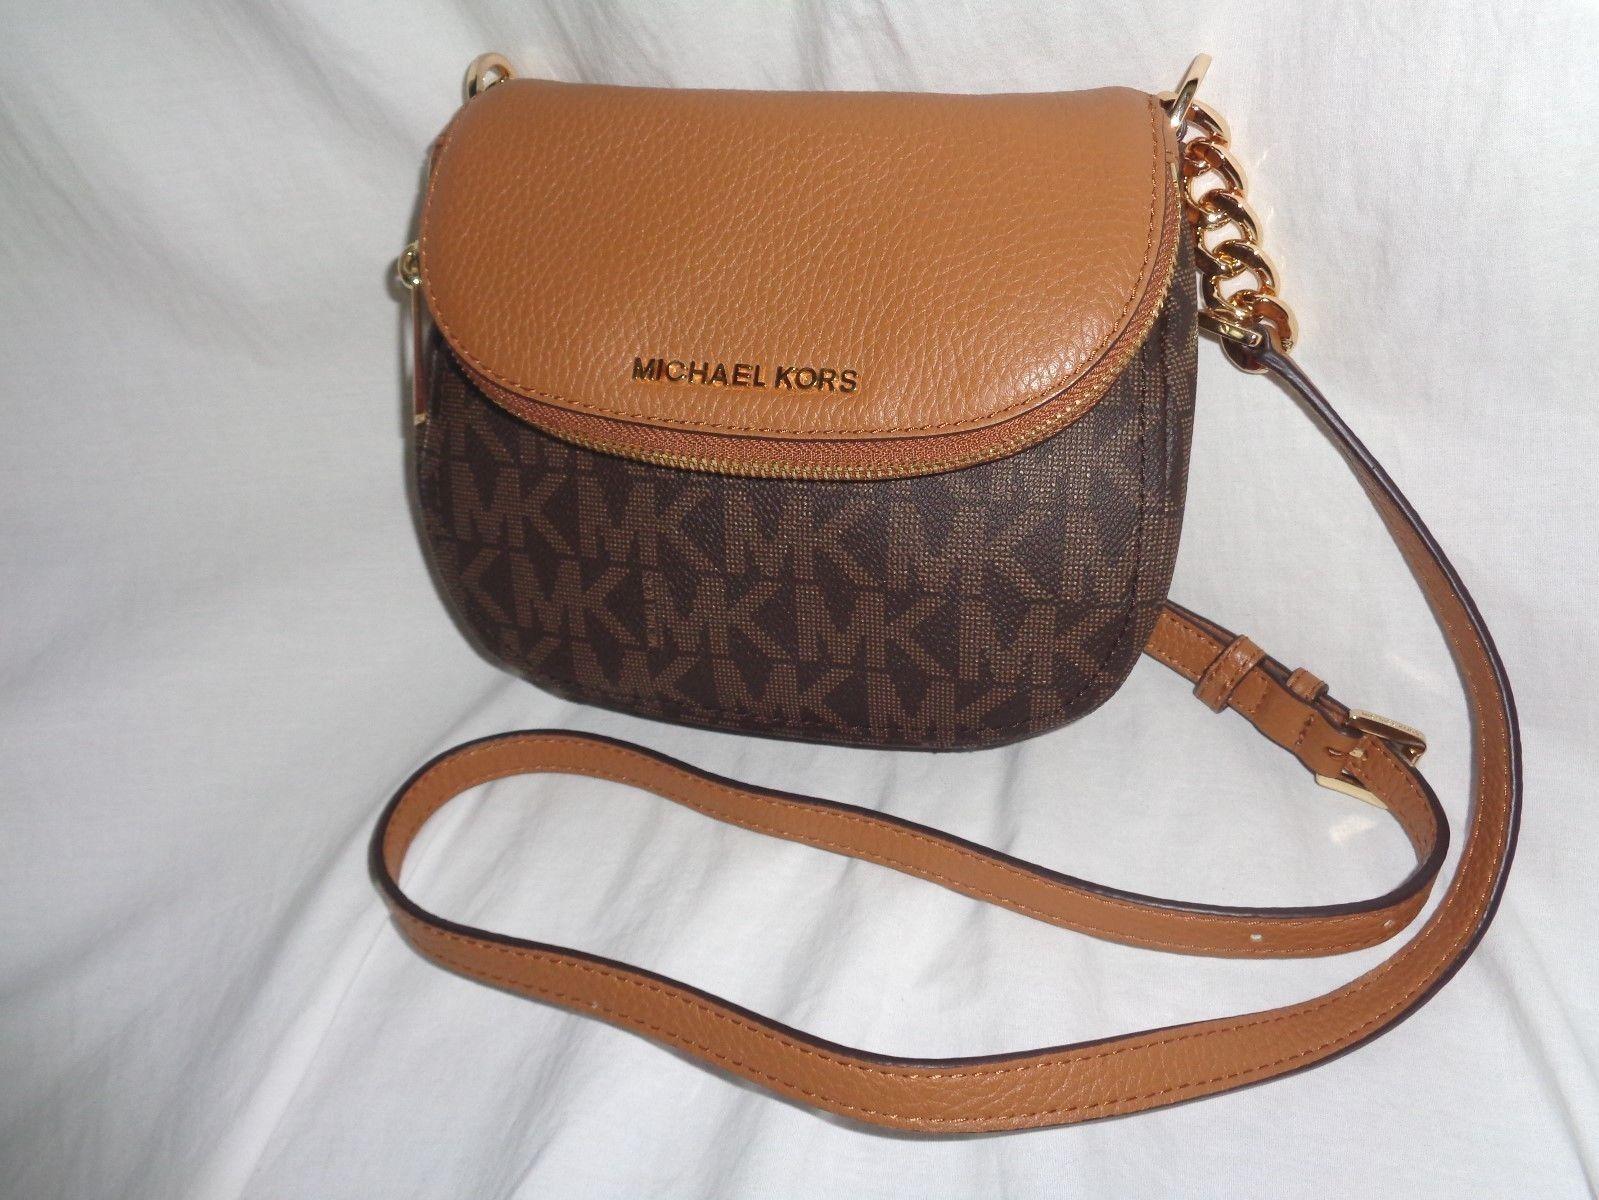 michael kors bedford flap crossbody bag sale michael kors outlet sale online